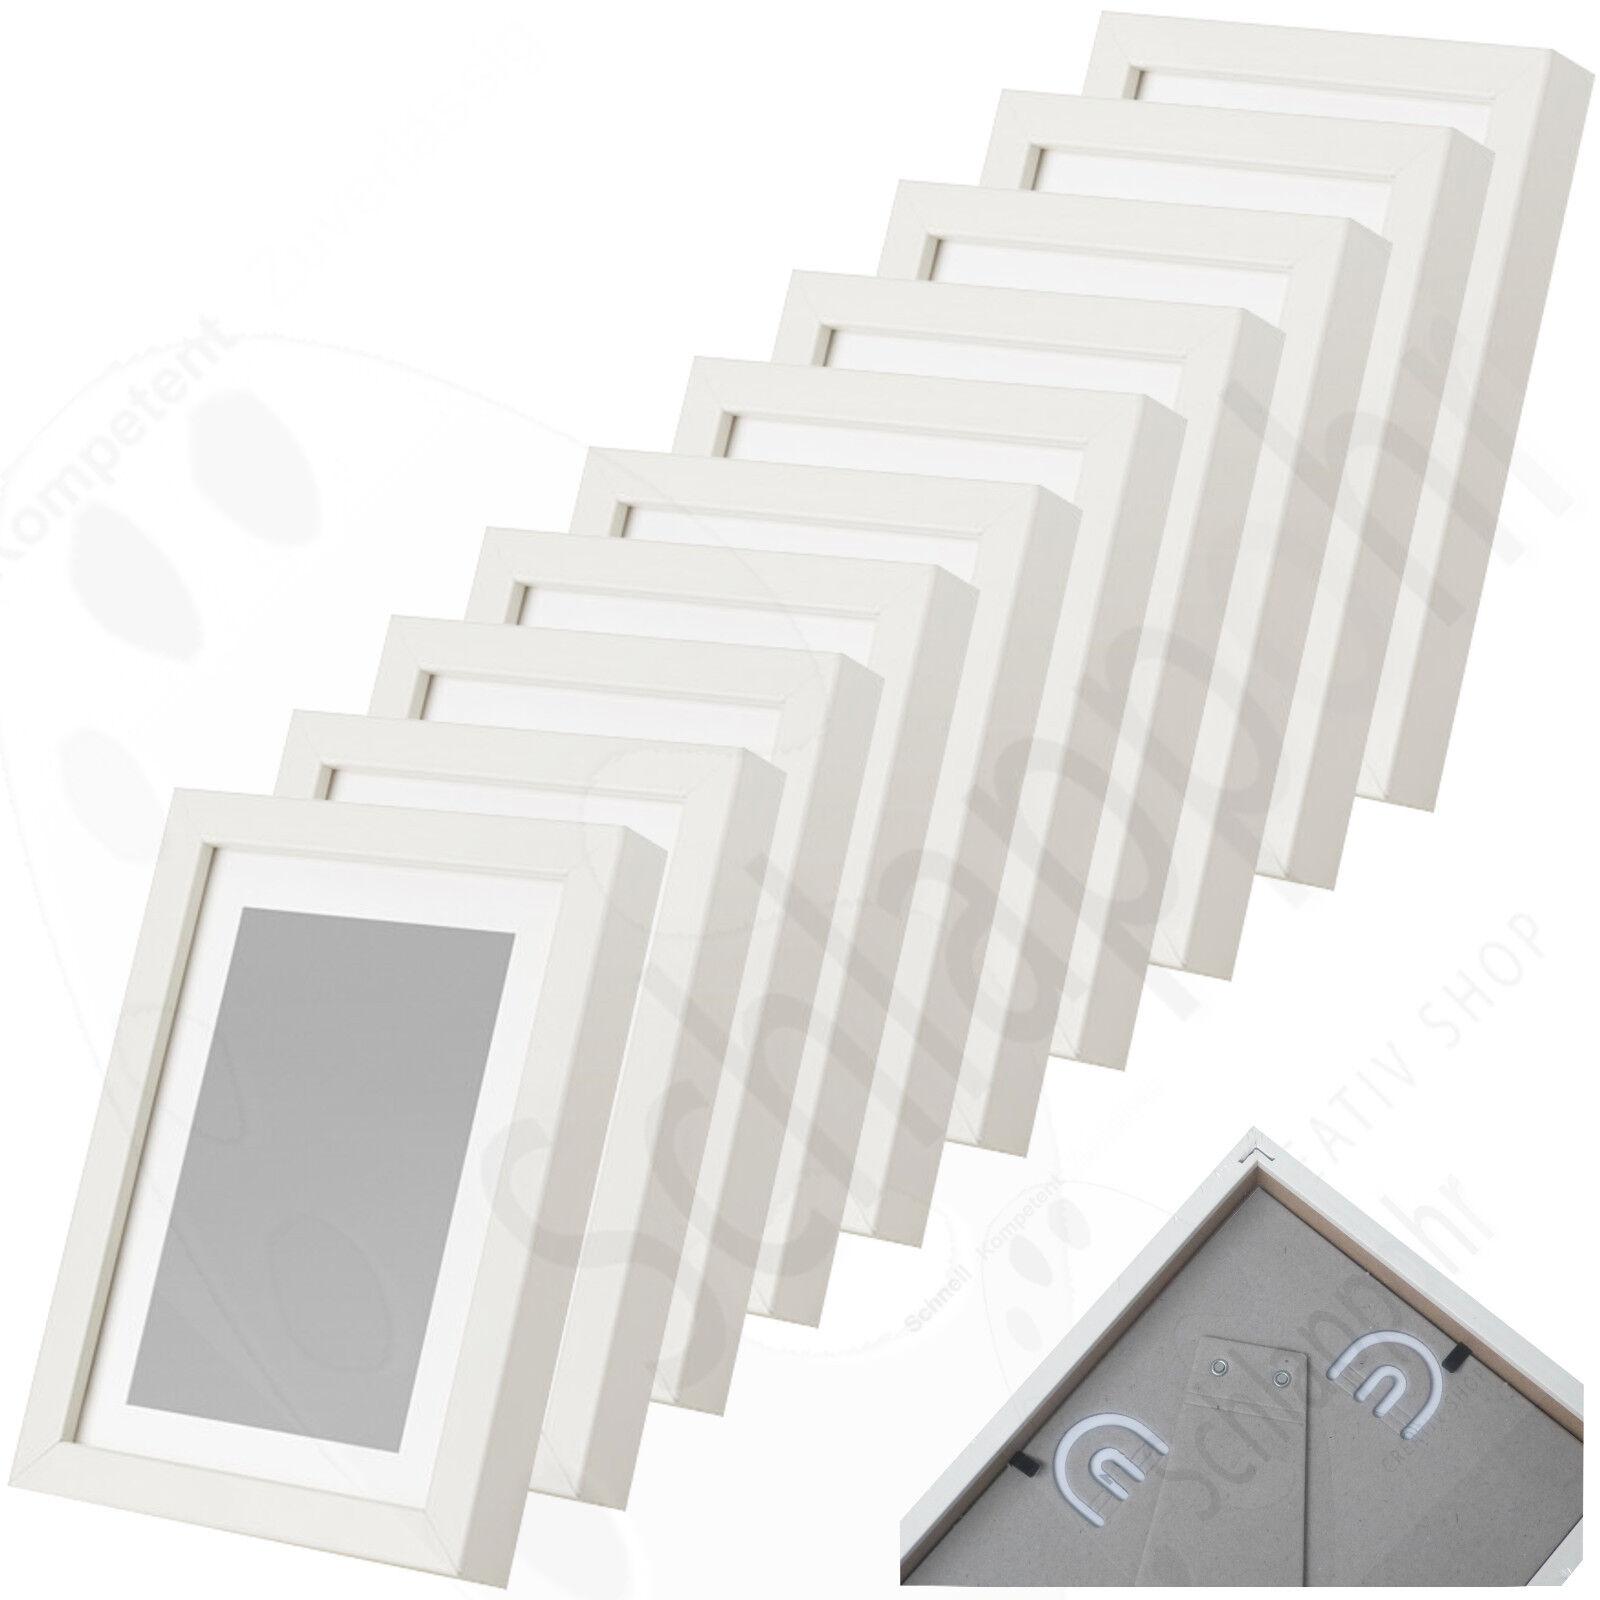 10 Stück Set IKEA LIMHALL 10x15 / 13x18 cm. Weiß/ Bilderrahmen ...